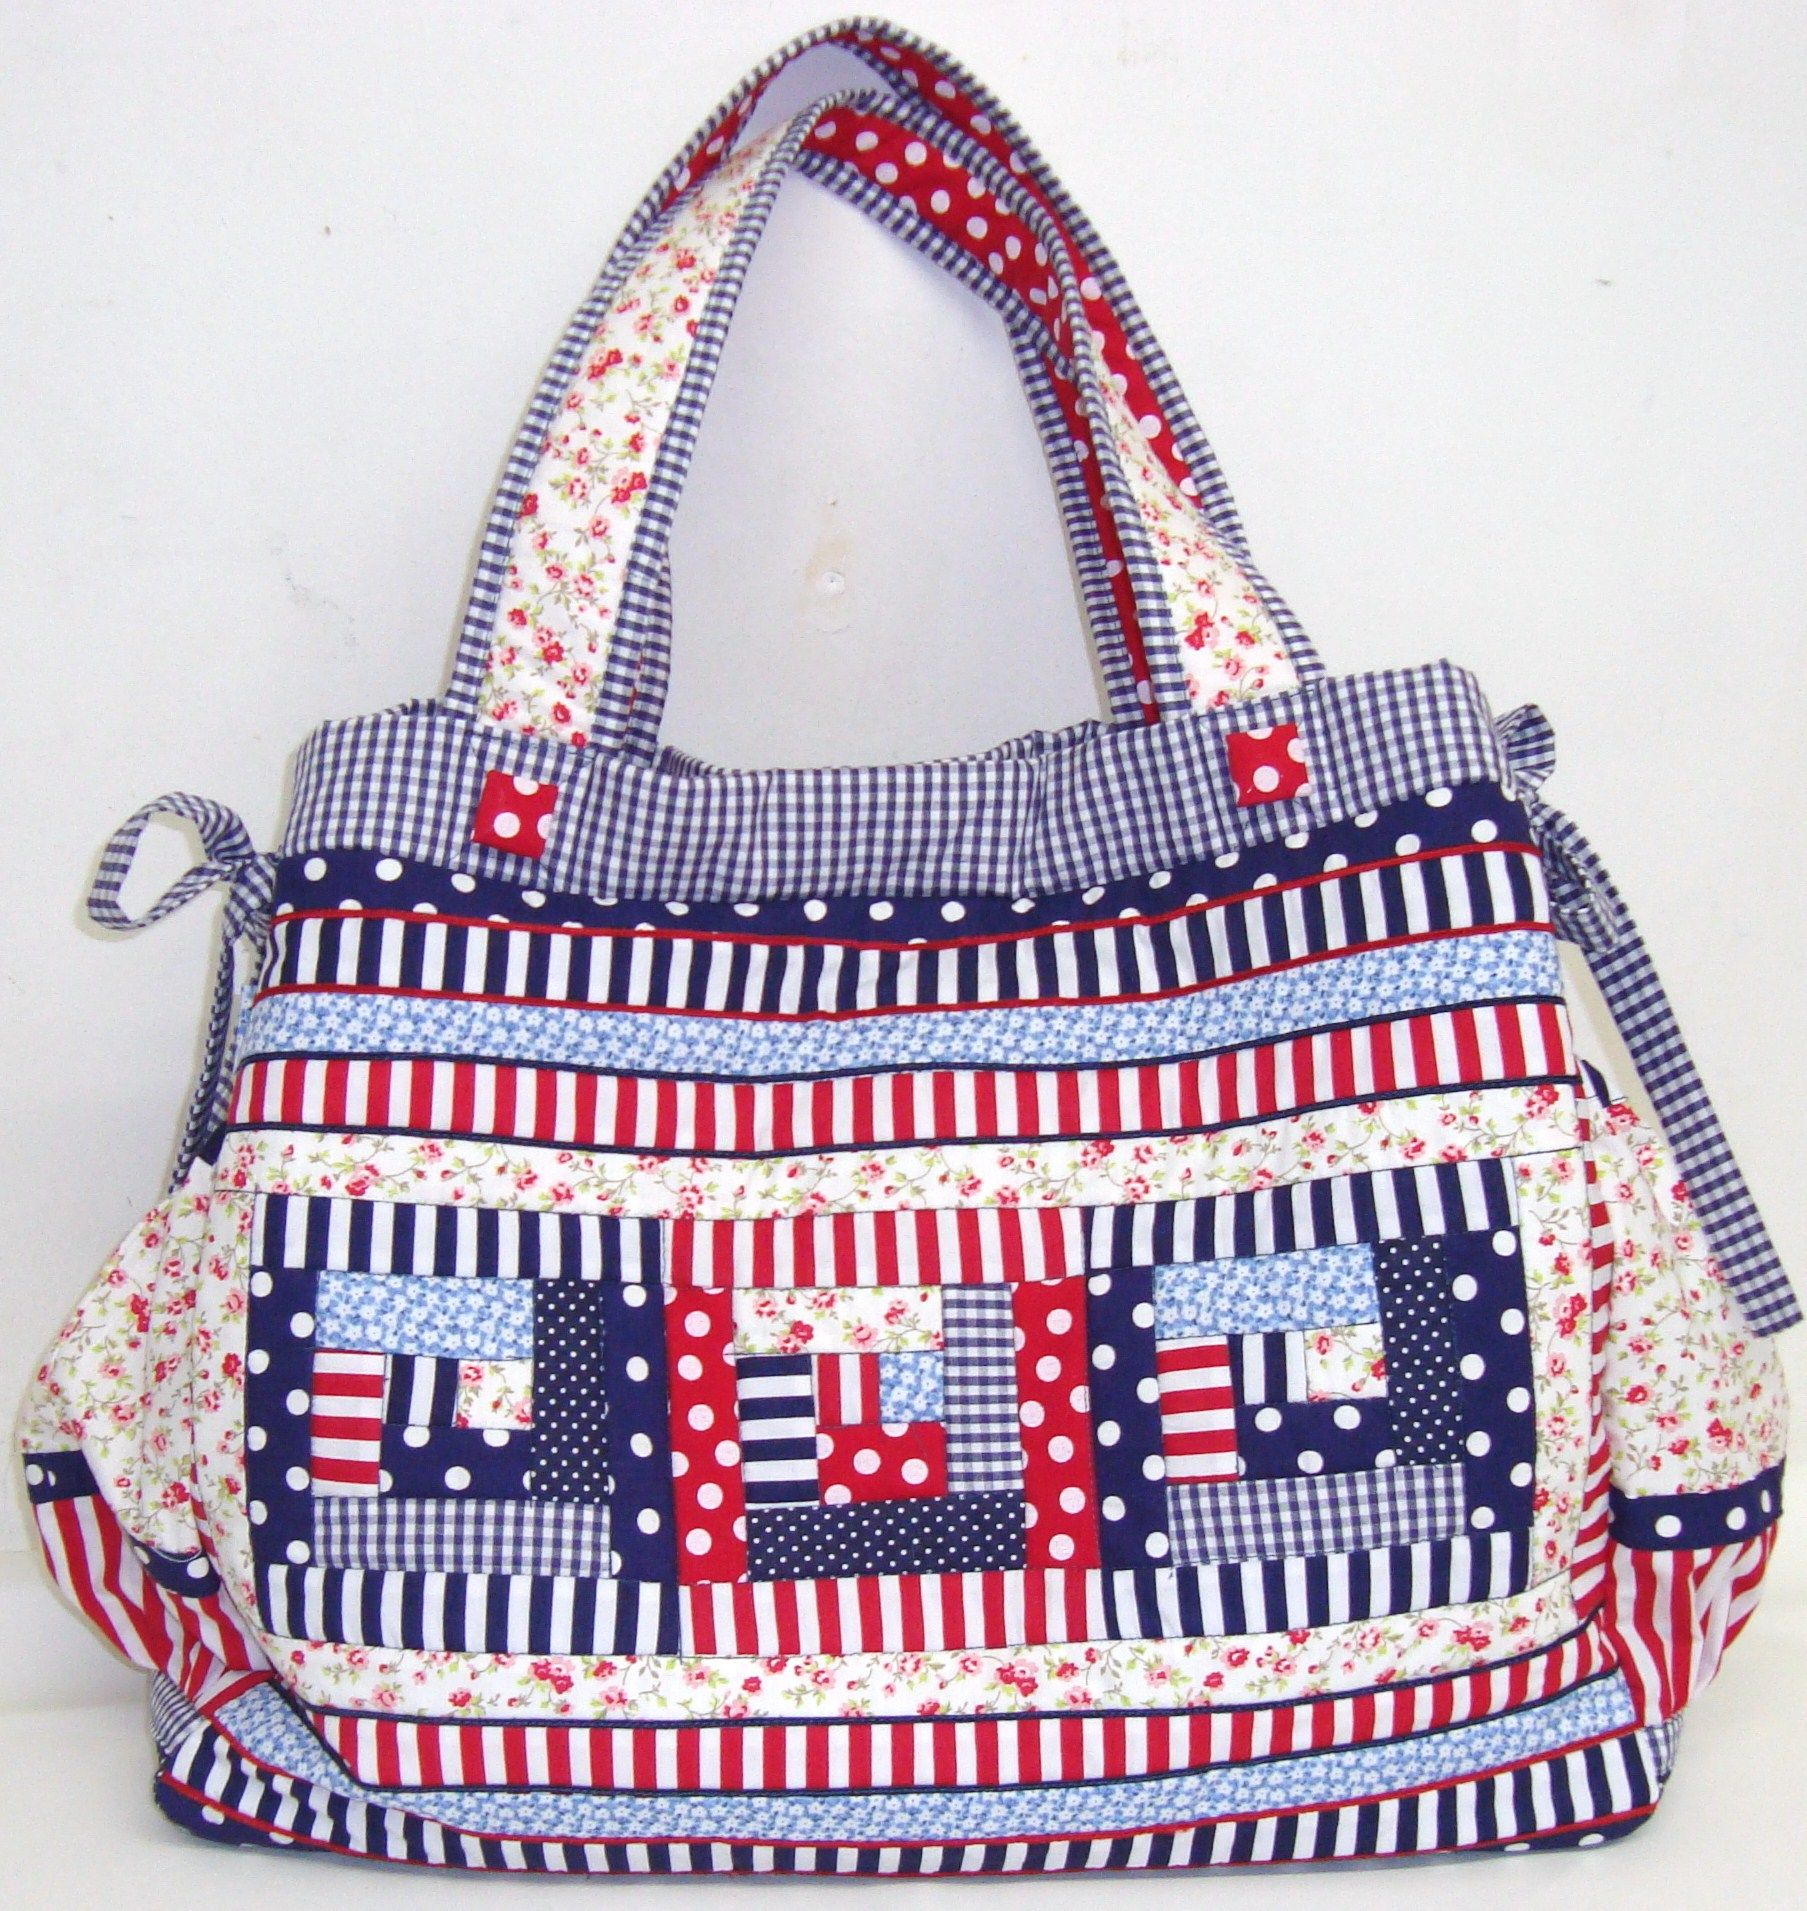 Bolsa maternidade de patchwork encomenda monicacordeiro m - Proyectos de patchwork ...